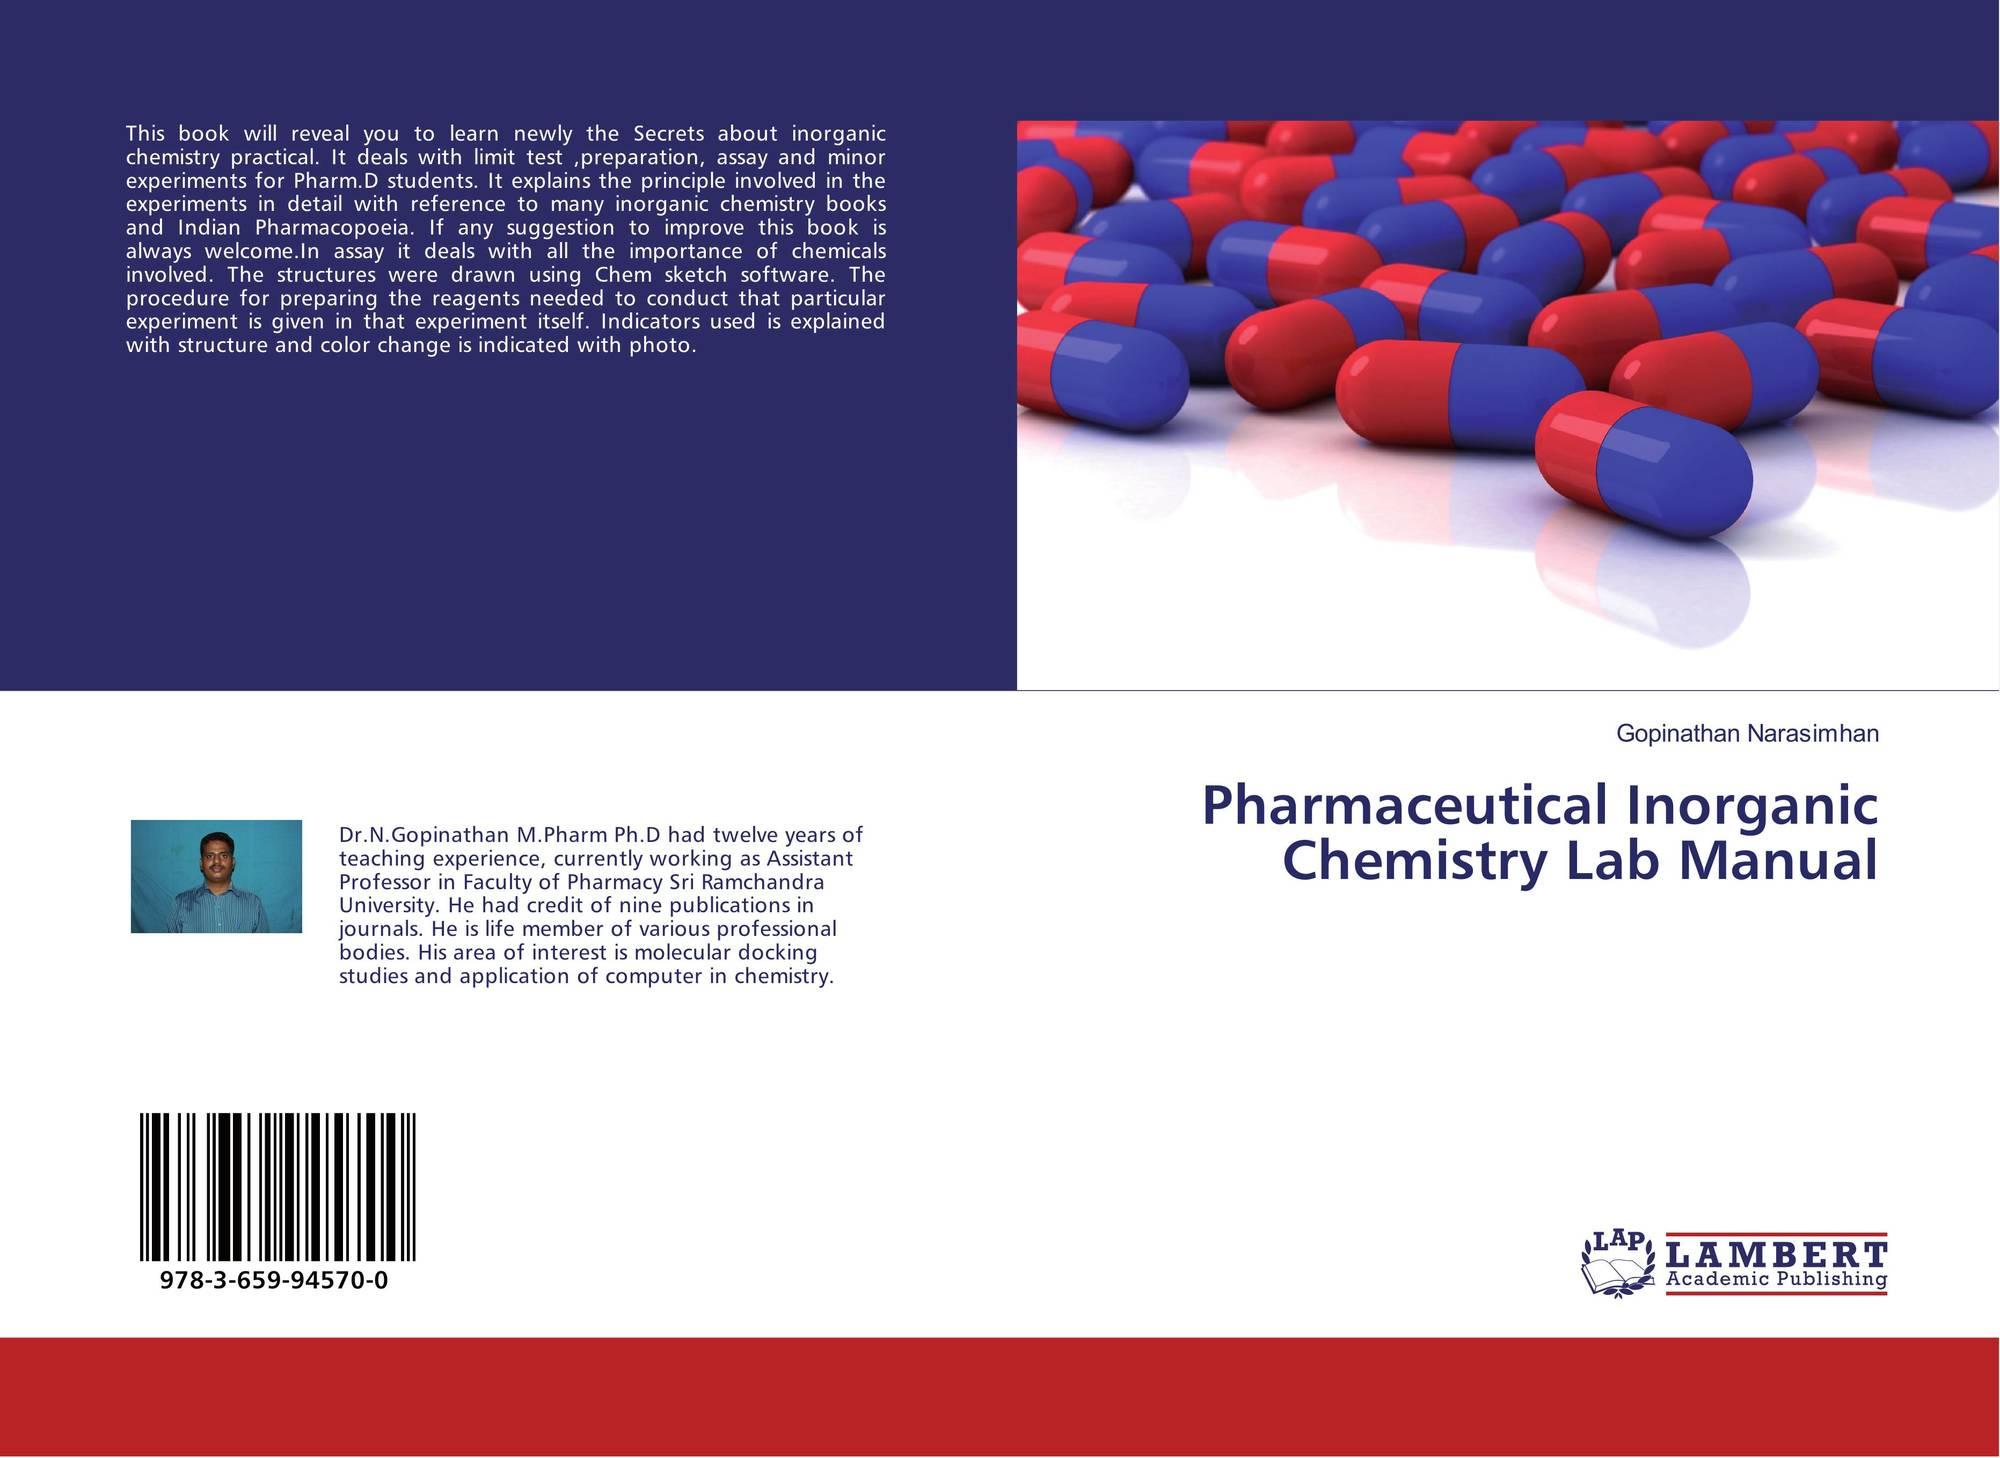 pharmaceutical inorganic chemistry lab manual 978 3 659 94570 0 rh morebooks de Organic Chemistry Lab Clinical Chemistry Laboratory Manual